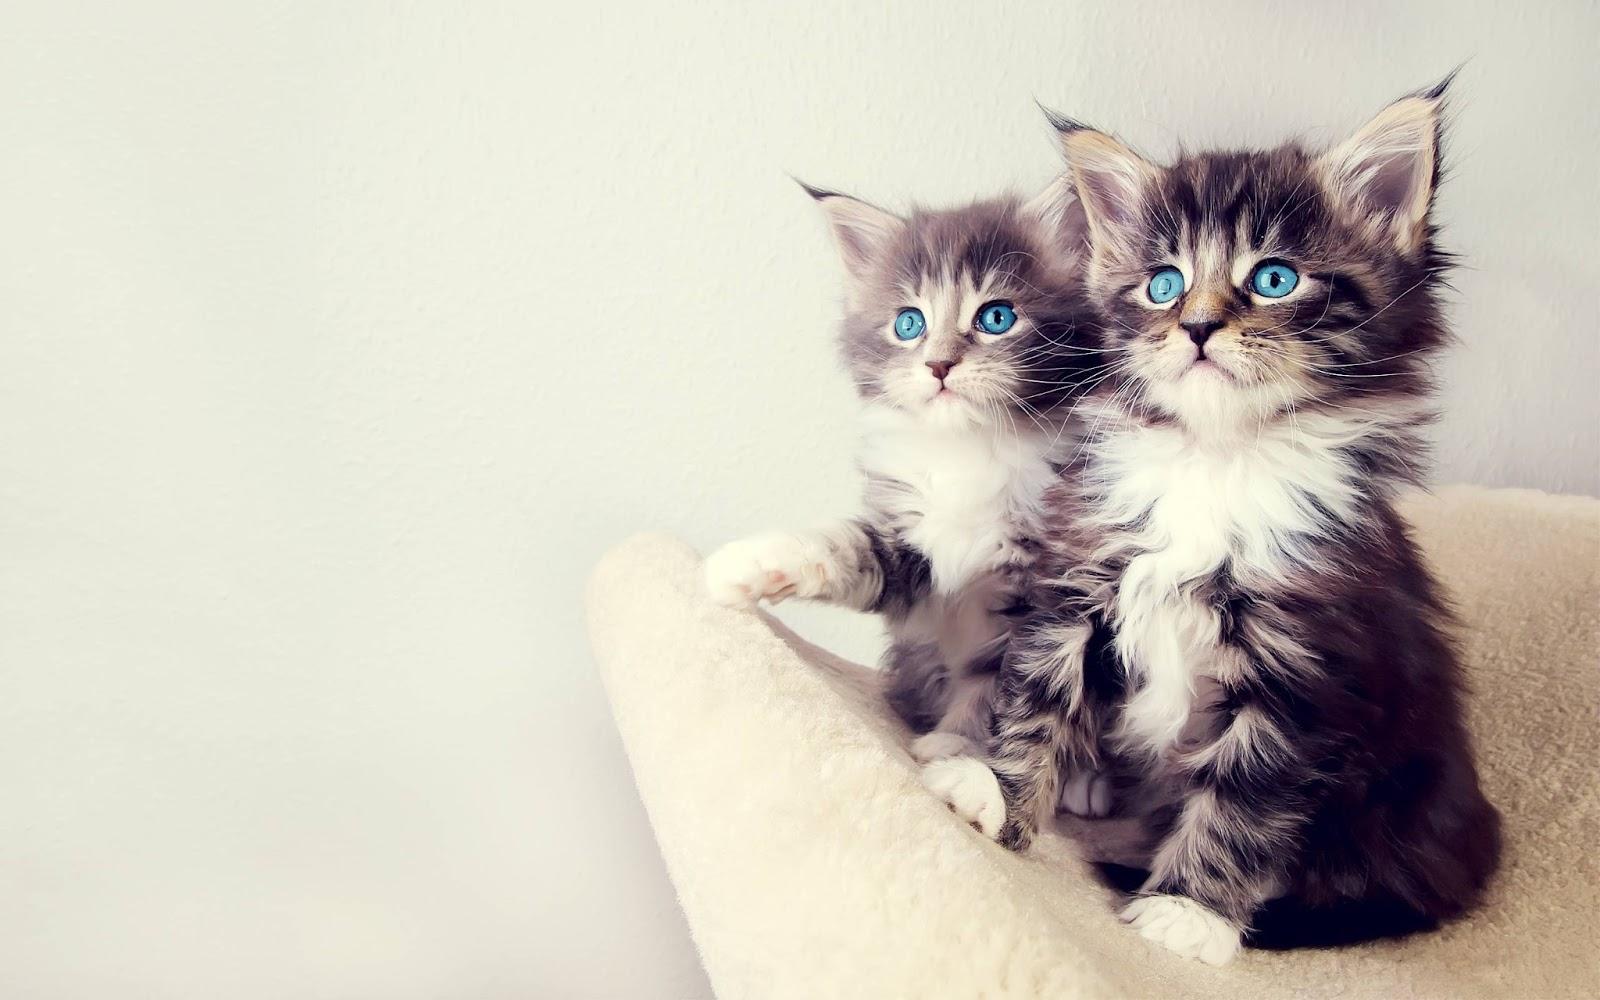 http://1.bp.blogspot.com/-RcK1OiebucU/UTewYY97oWI/AAAAAAAAG1U/5lqjkS36PeU/s1600/Two-little-cats-the-most-beautiful-eyes.jpg